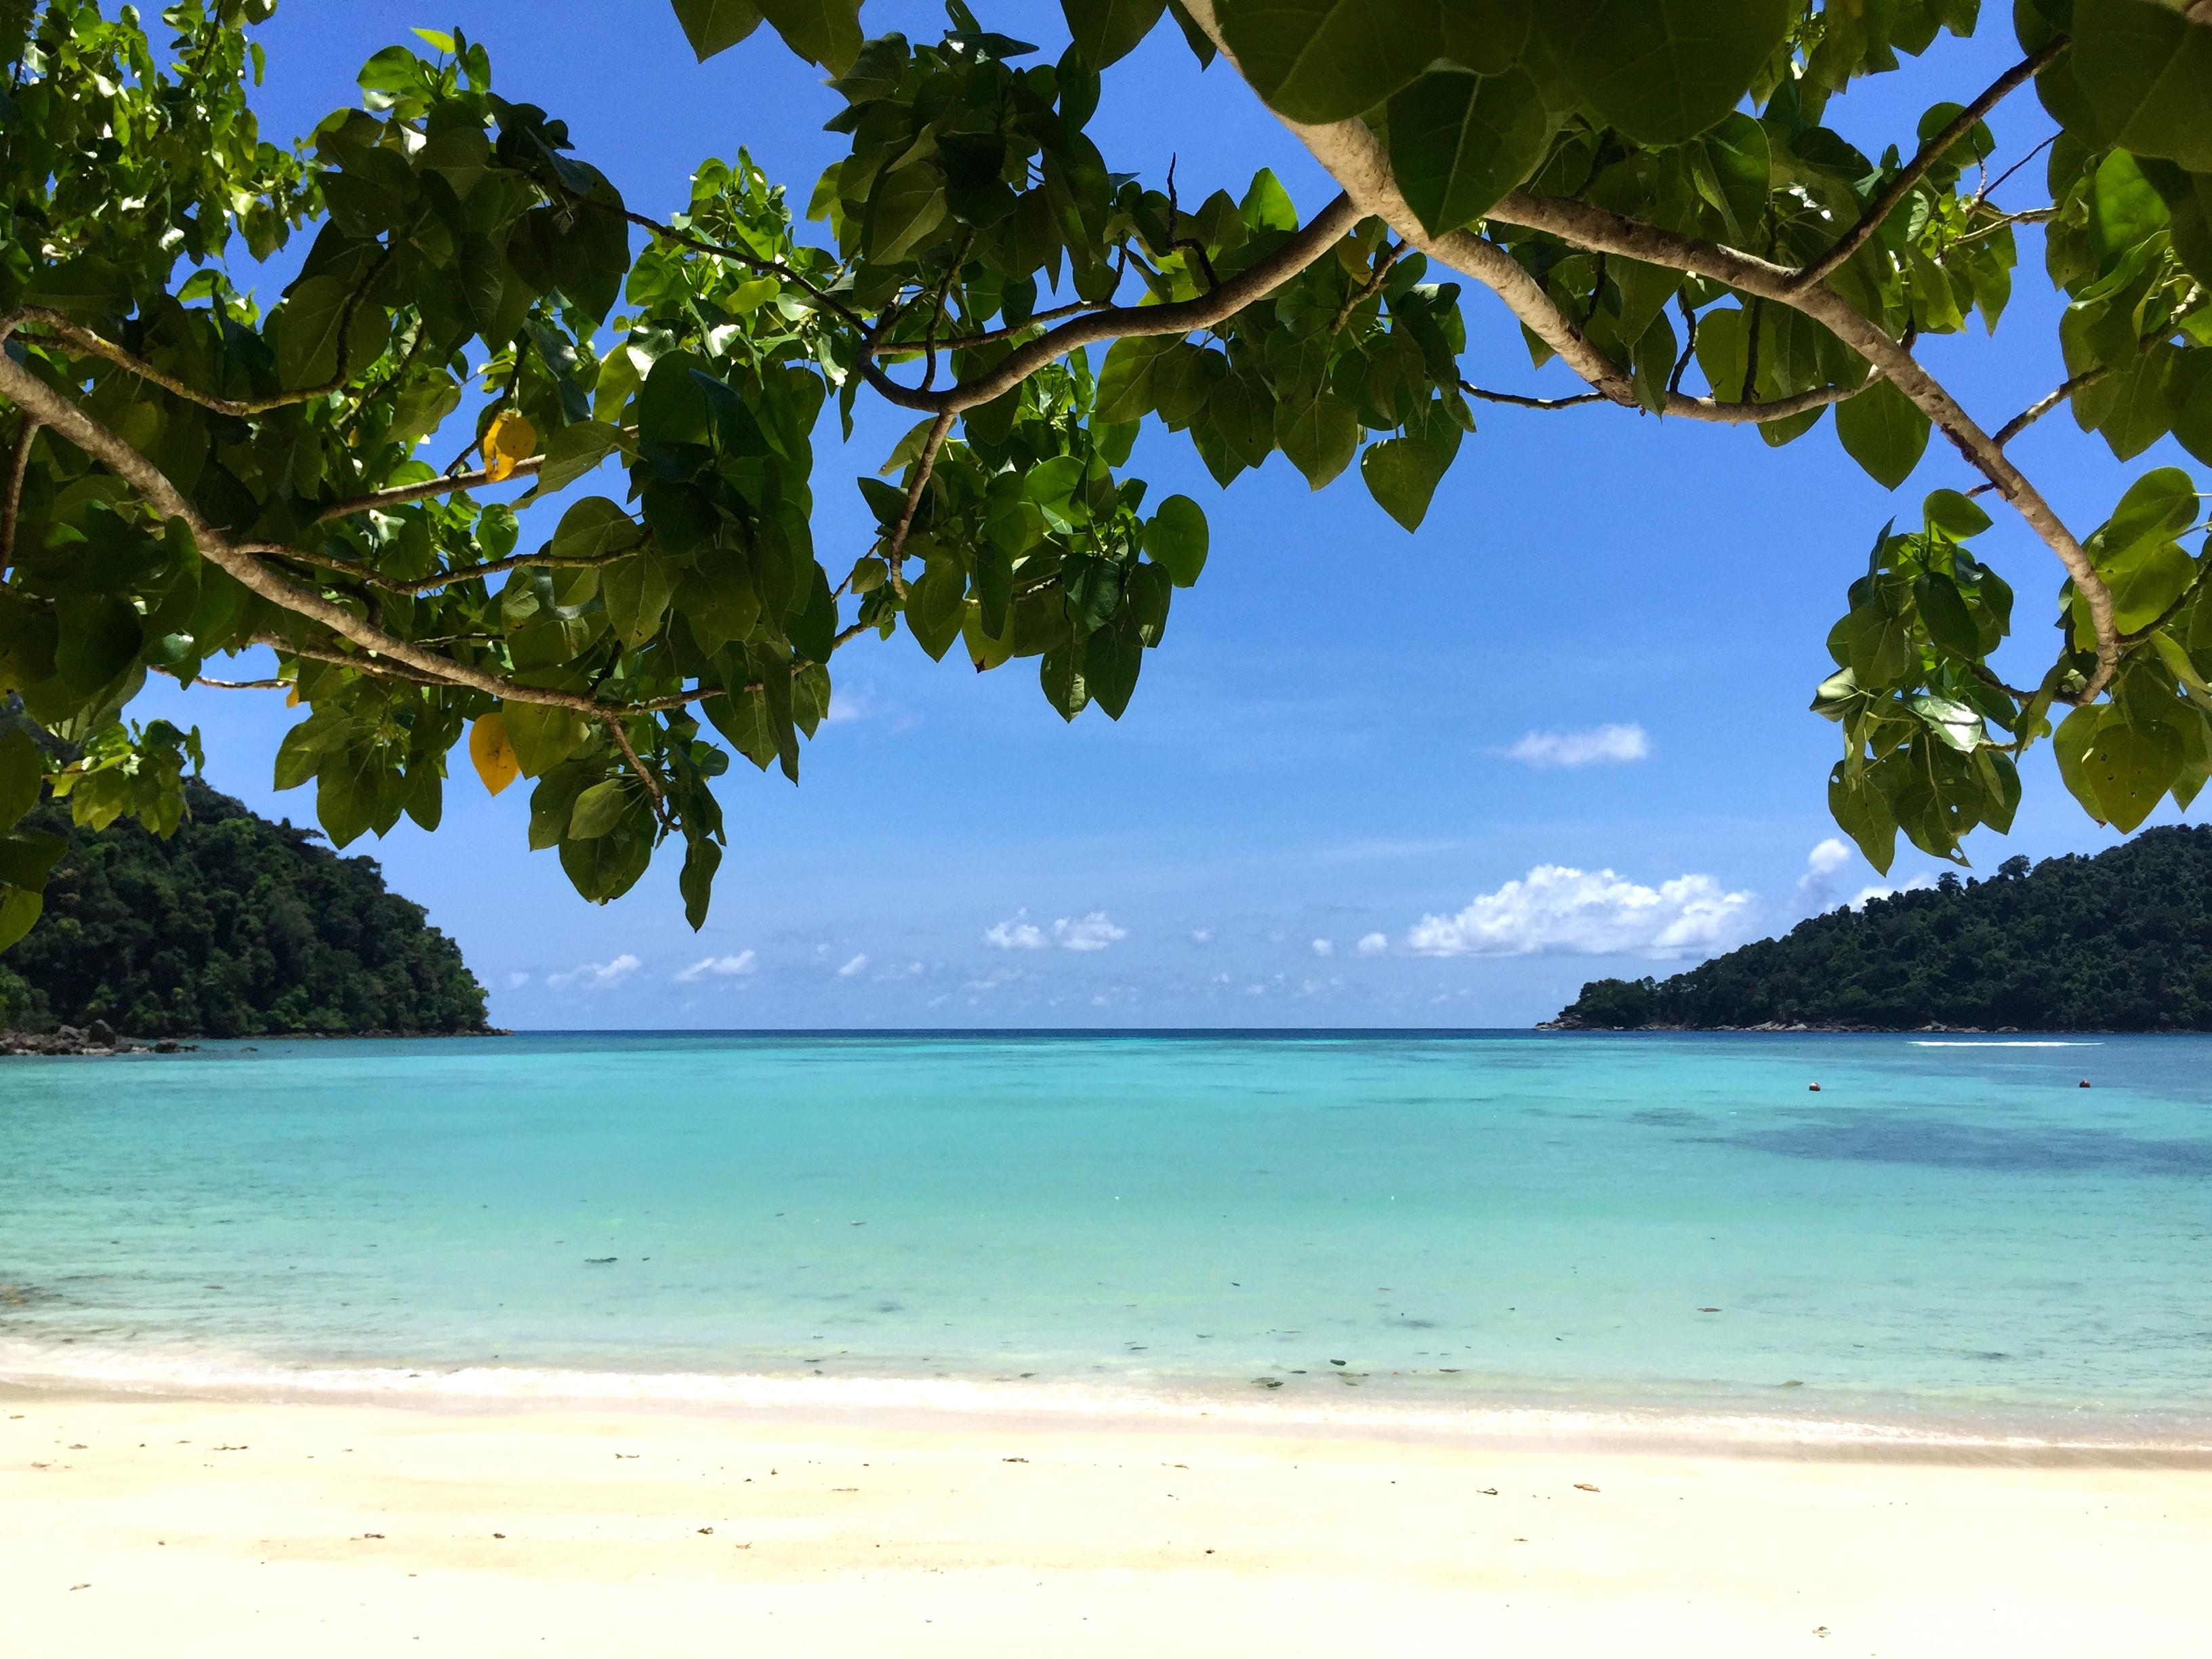 5 REASONS WHY SURIN ISLANDS ARE YOUR NEXT DREAM DESTINATION | 5 เหตุผลที่ทำให้คุณต้องไปหมู่เกาะสุรินทร์